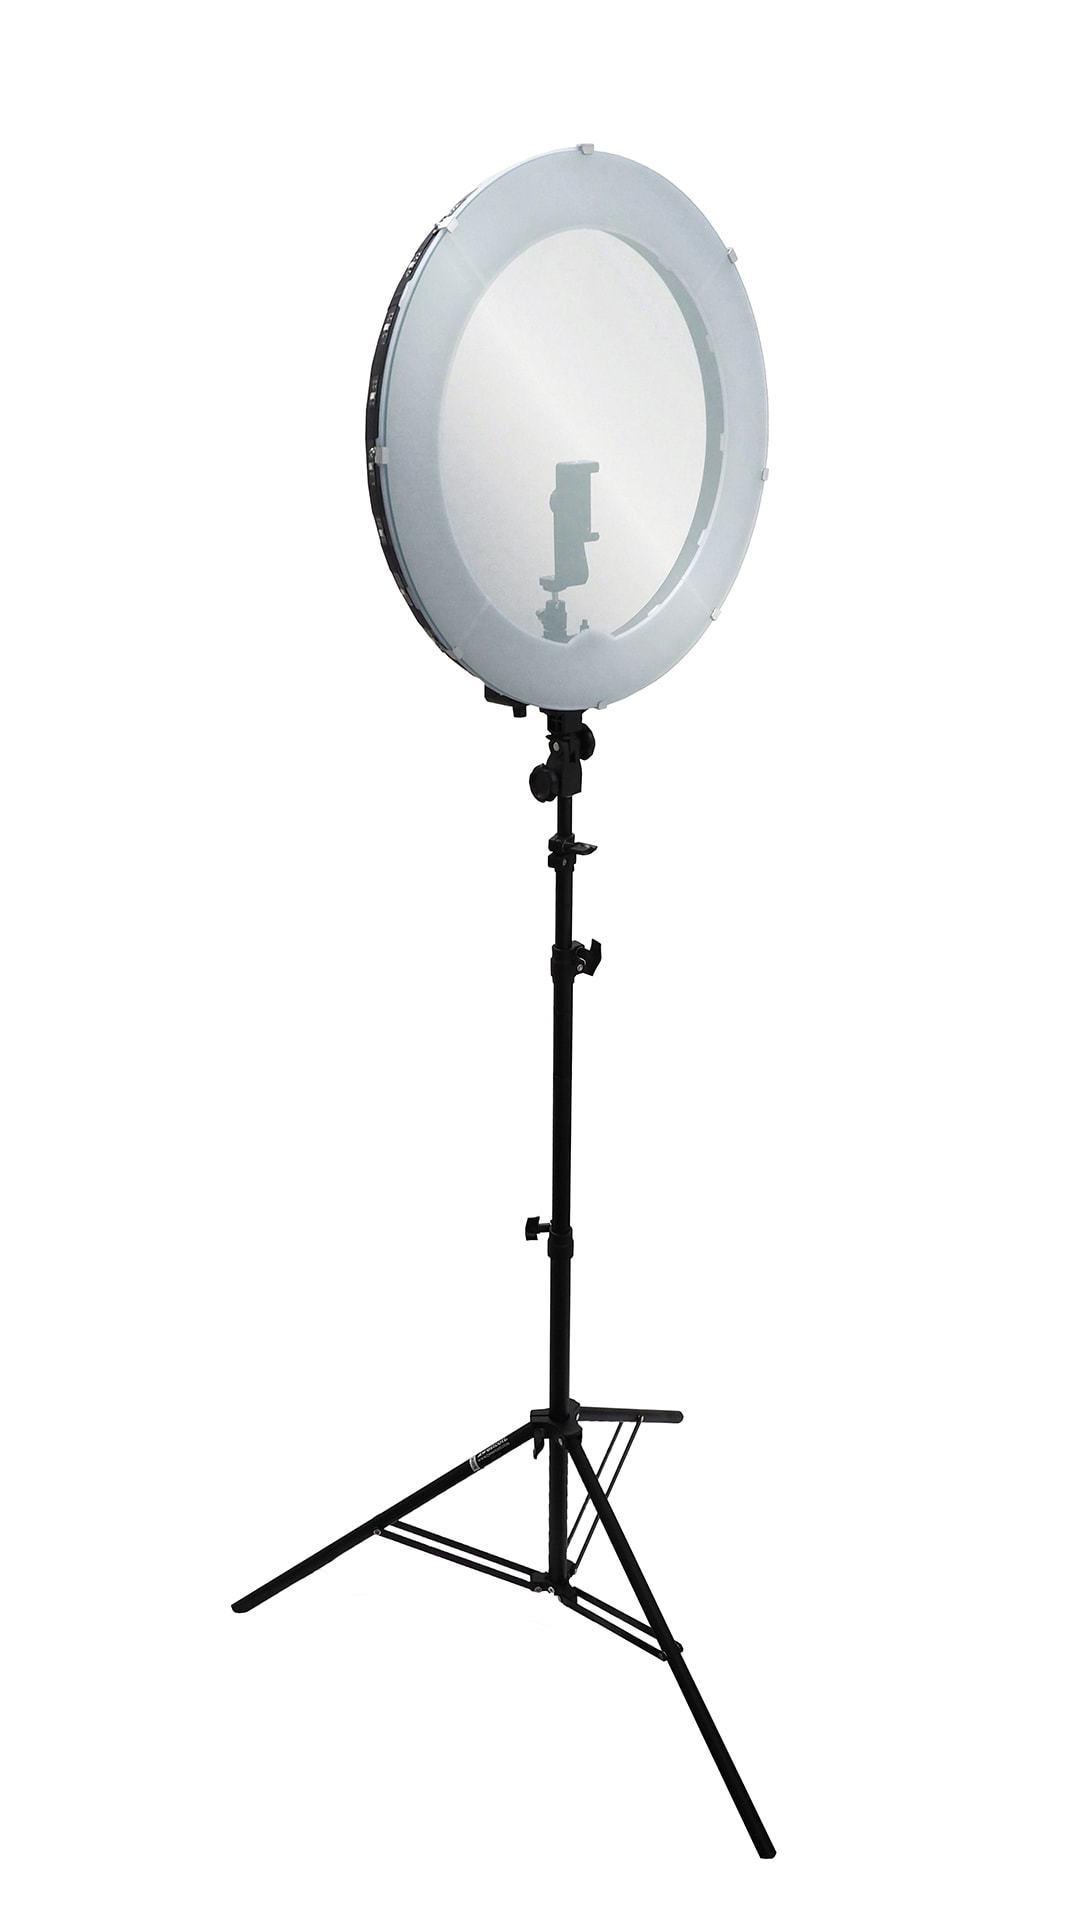 Halo Ring Light Mirror Record Makeup